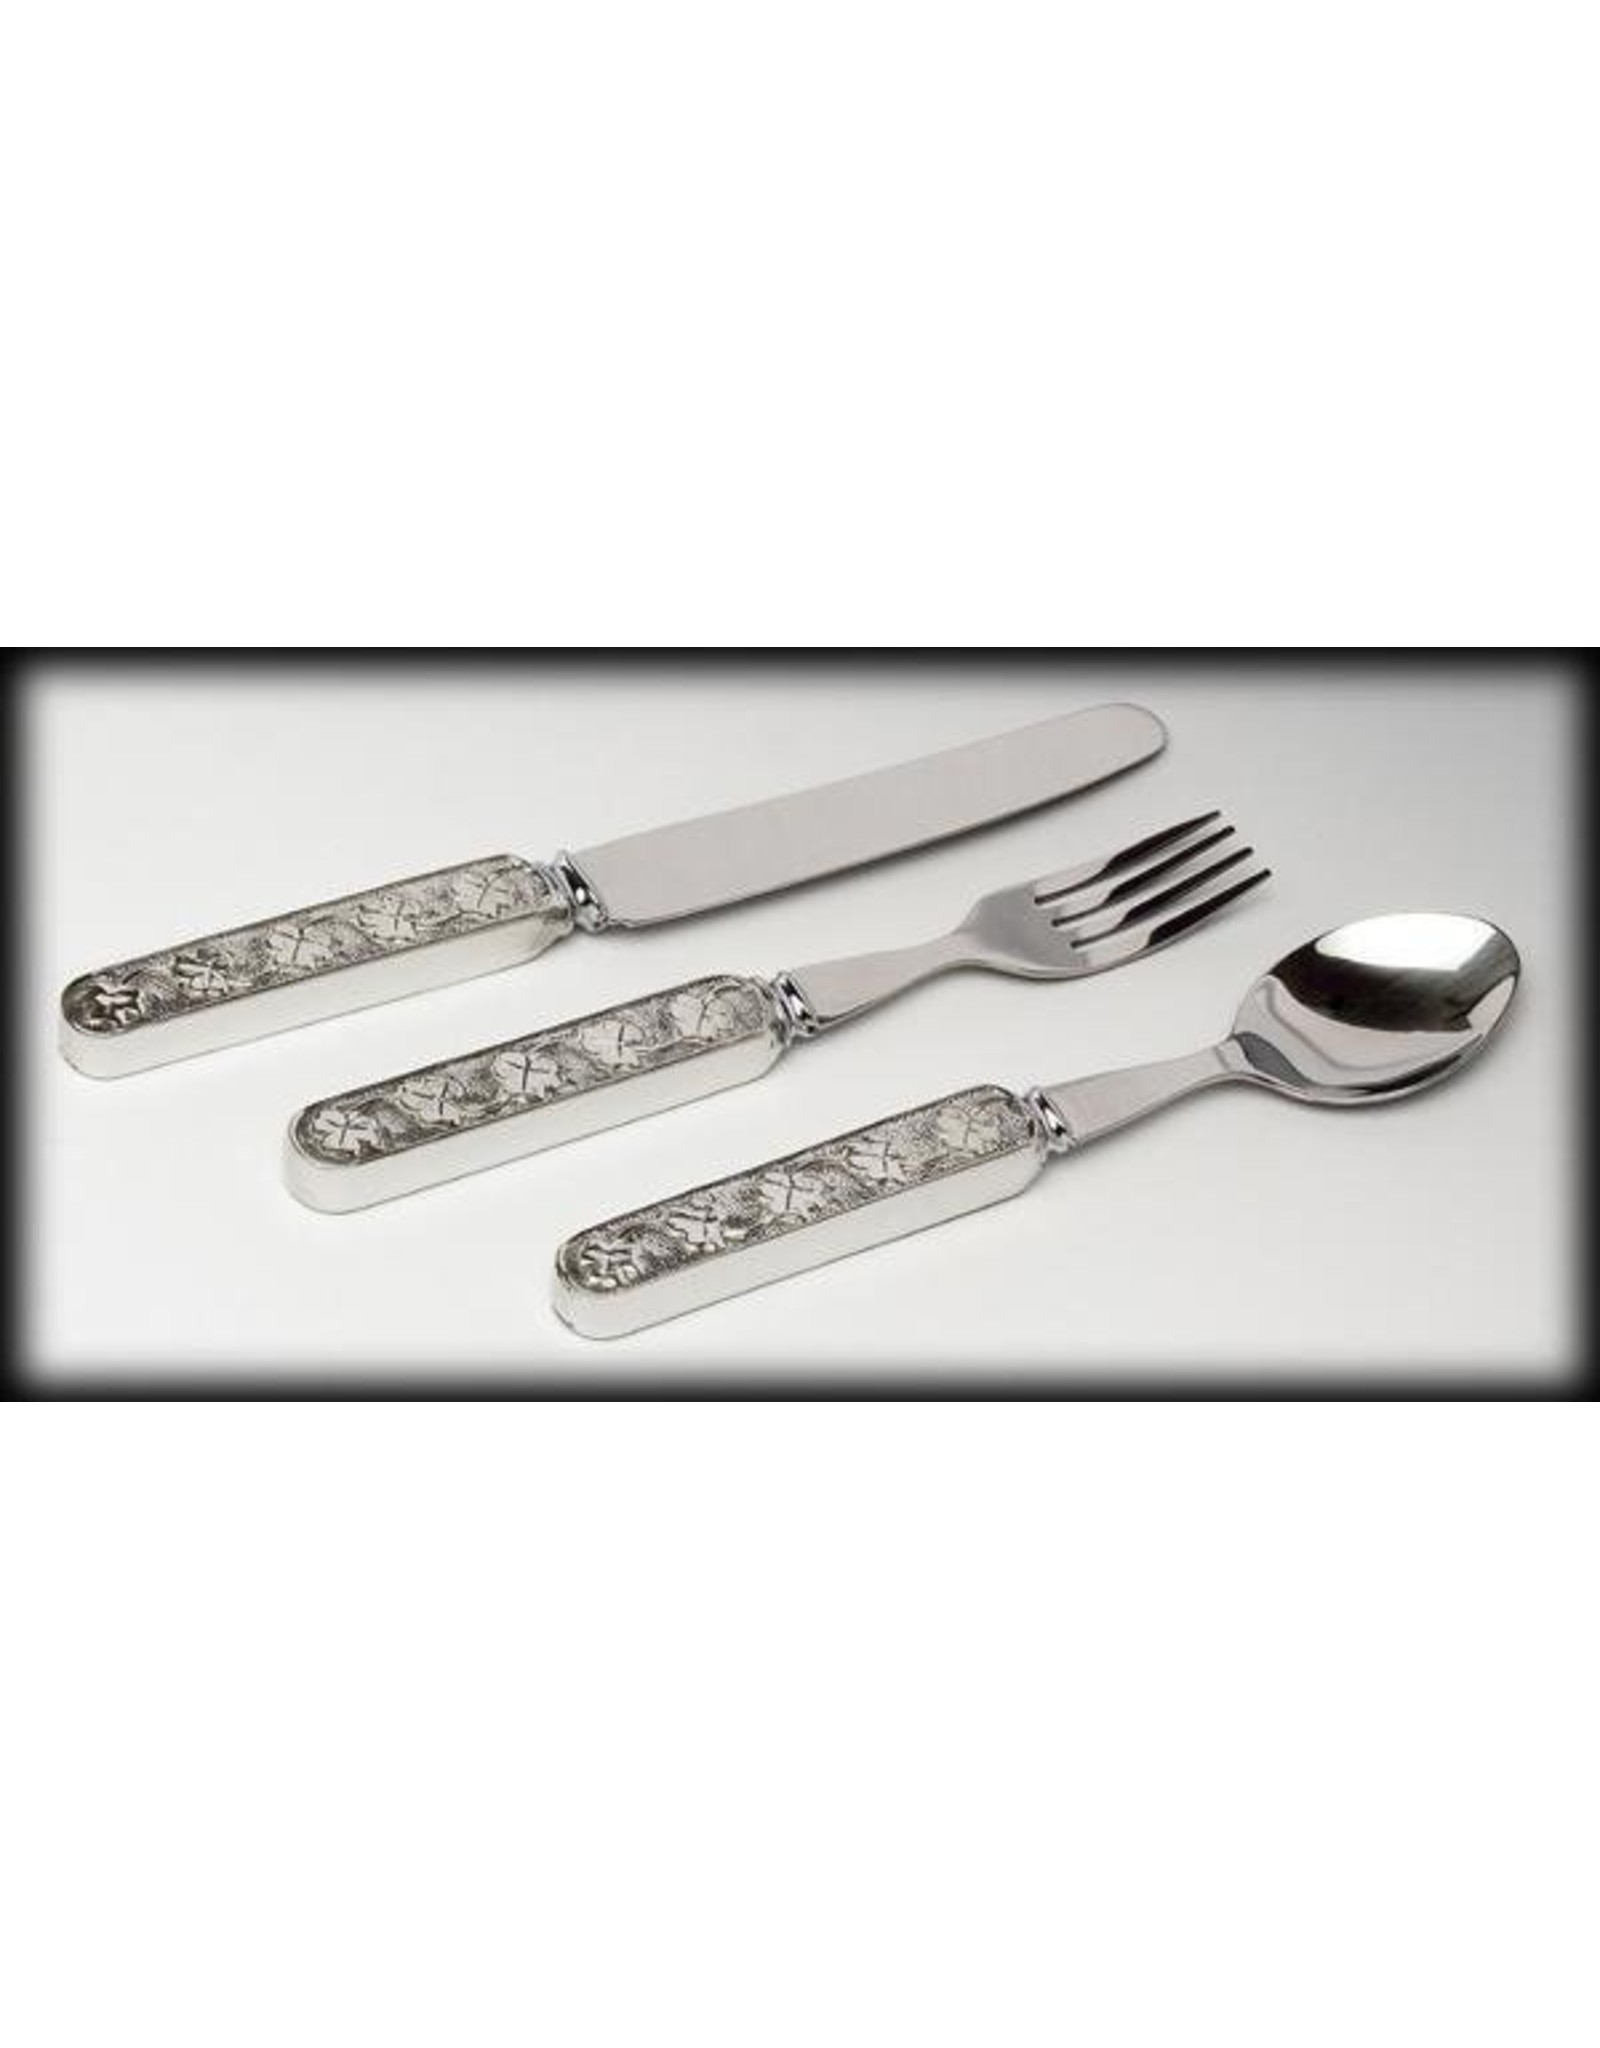 Mullingar Pewter Shamrock Baby Cutlery Set by Mullingar Pewter